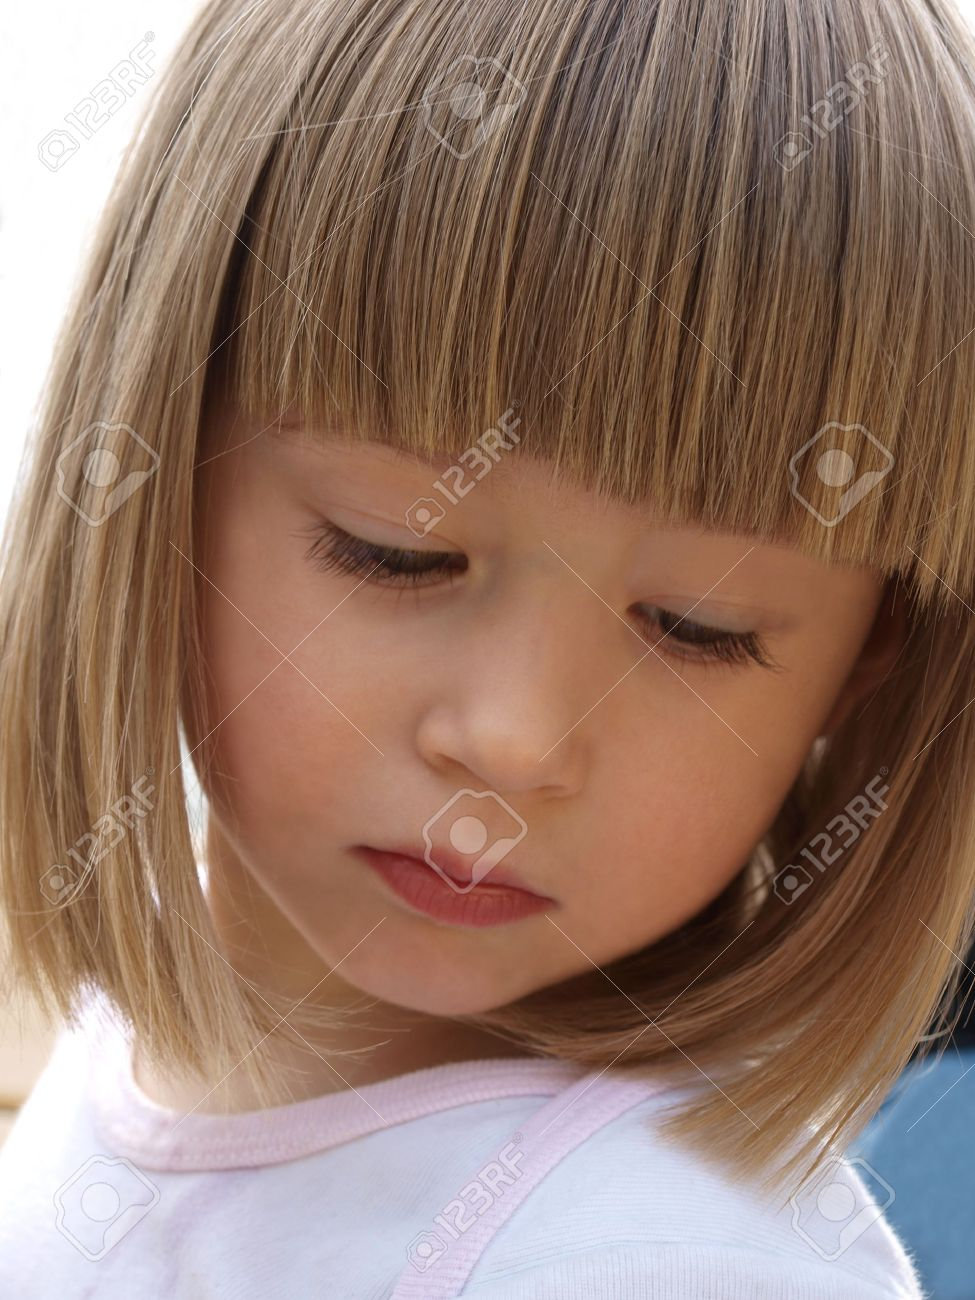 Фото стрижки детей с челкой